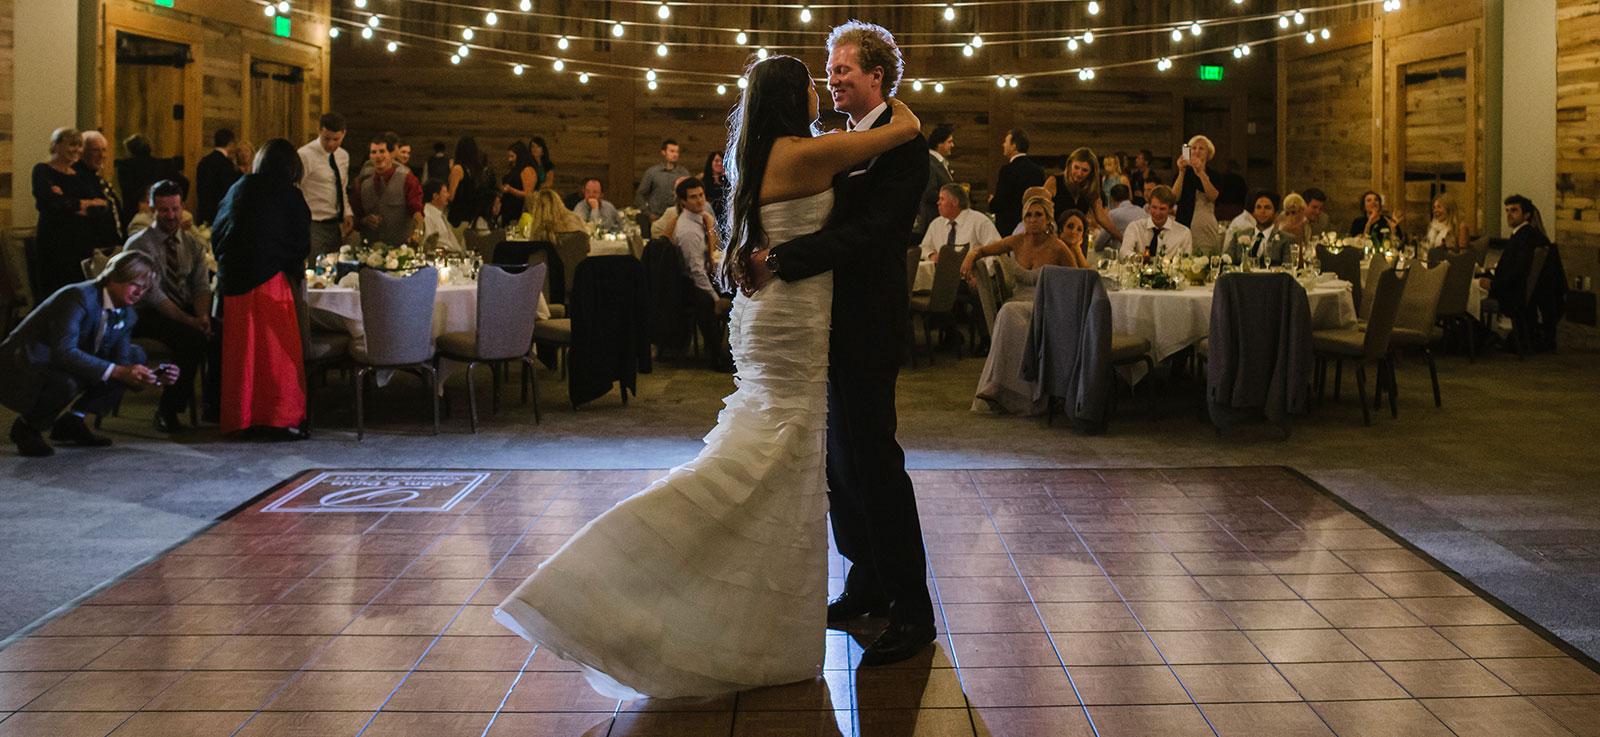 portable dance floors – snaplock dance floors